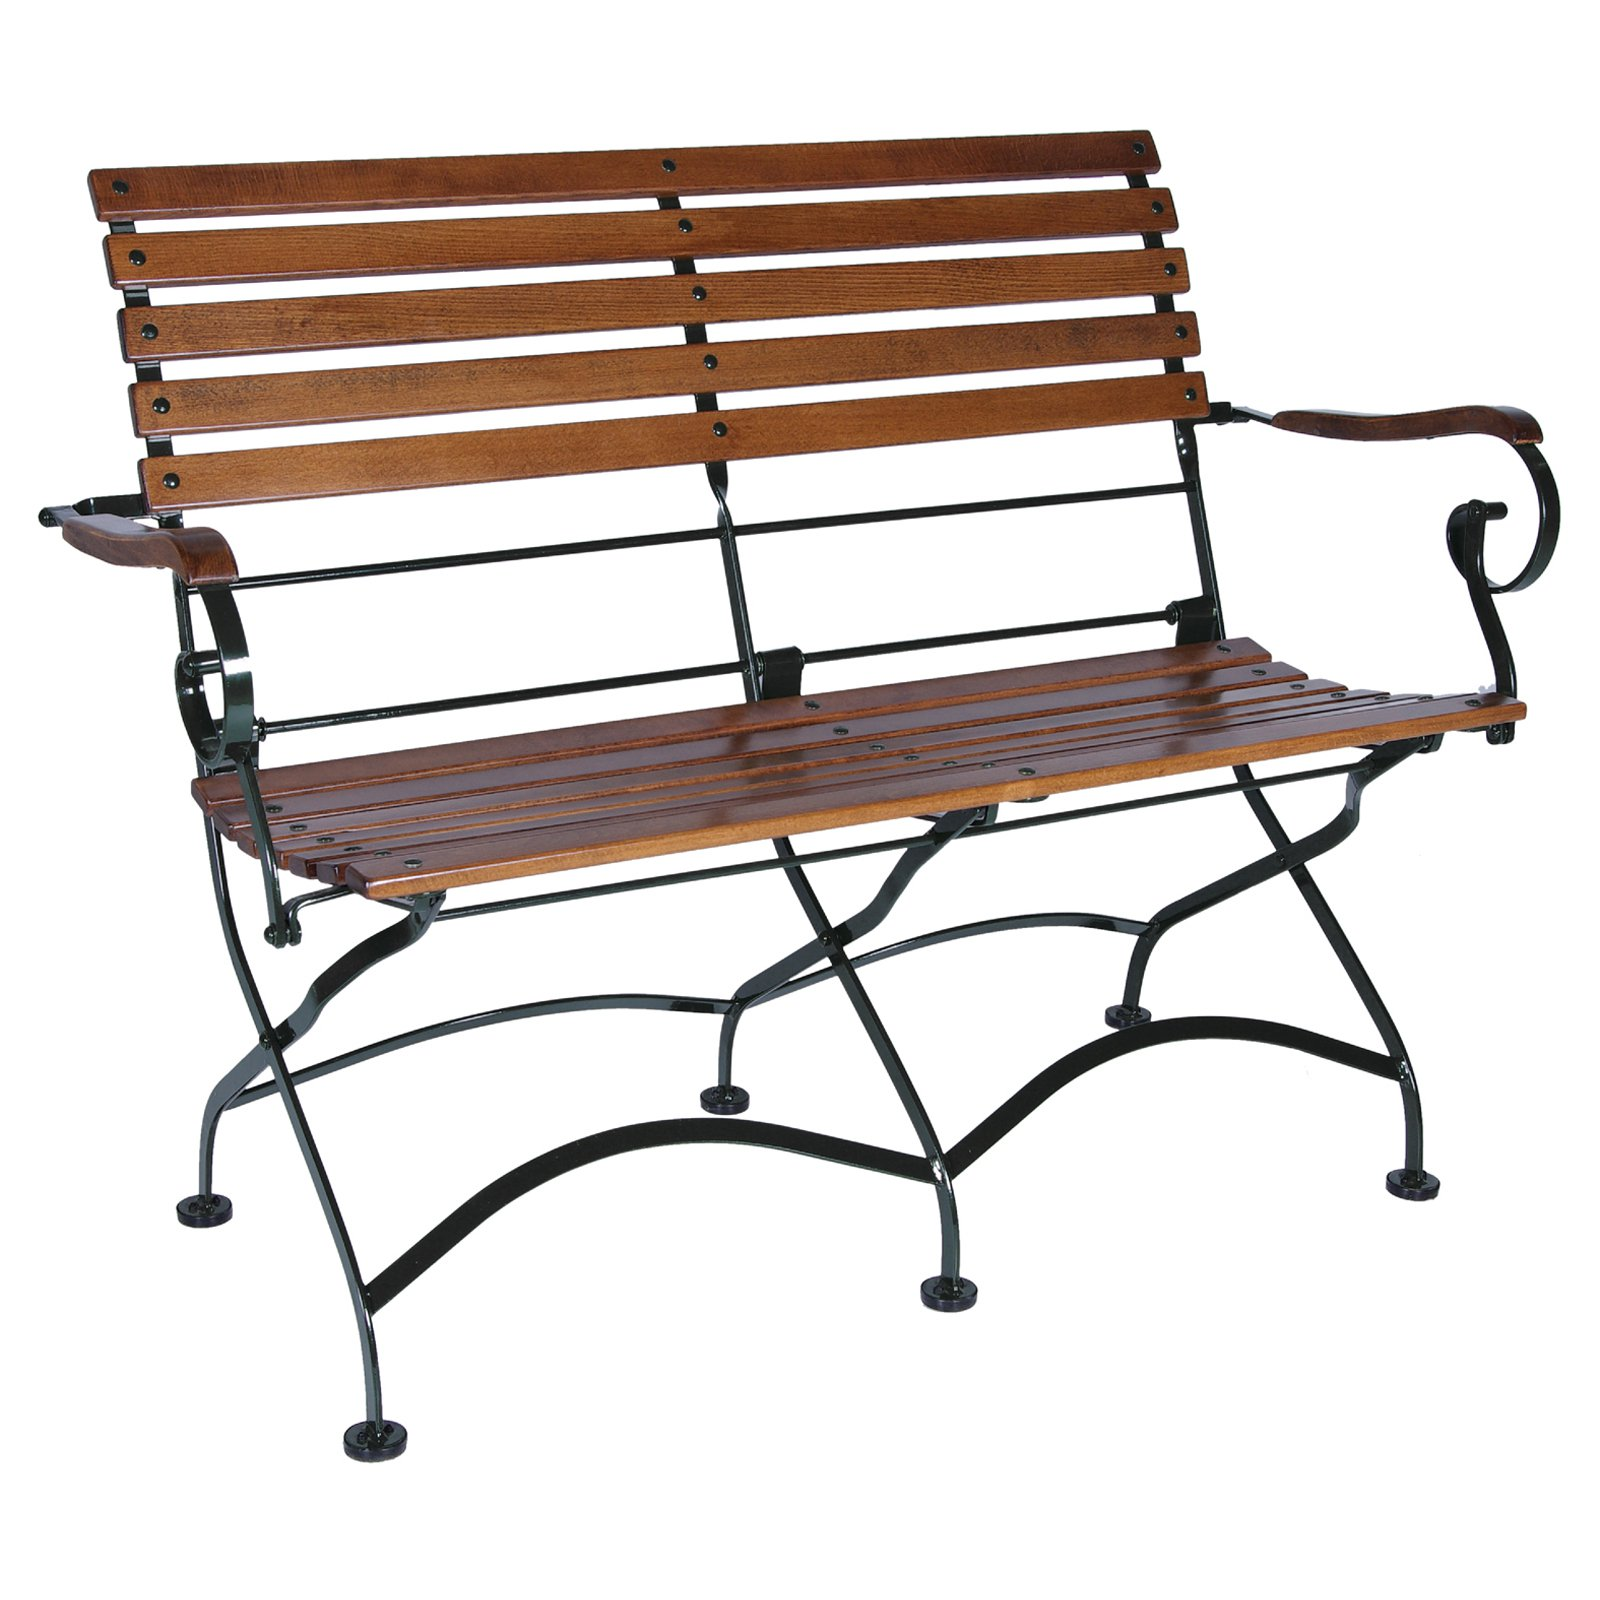 Furniture Designhouse French Veranda Grand Cafe 2 Seat Folding Bench with European Chestnut Wood Slats